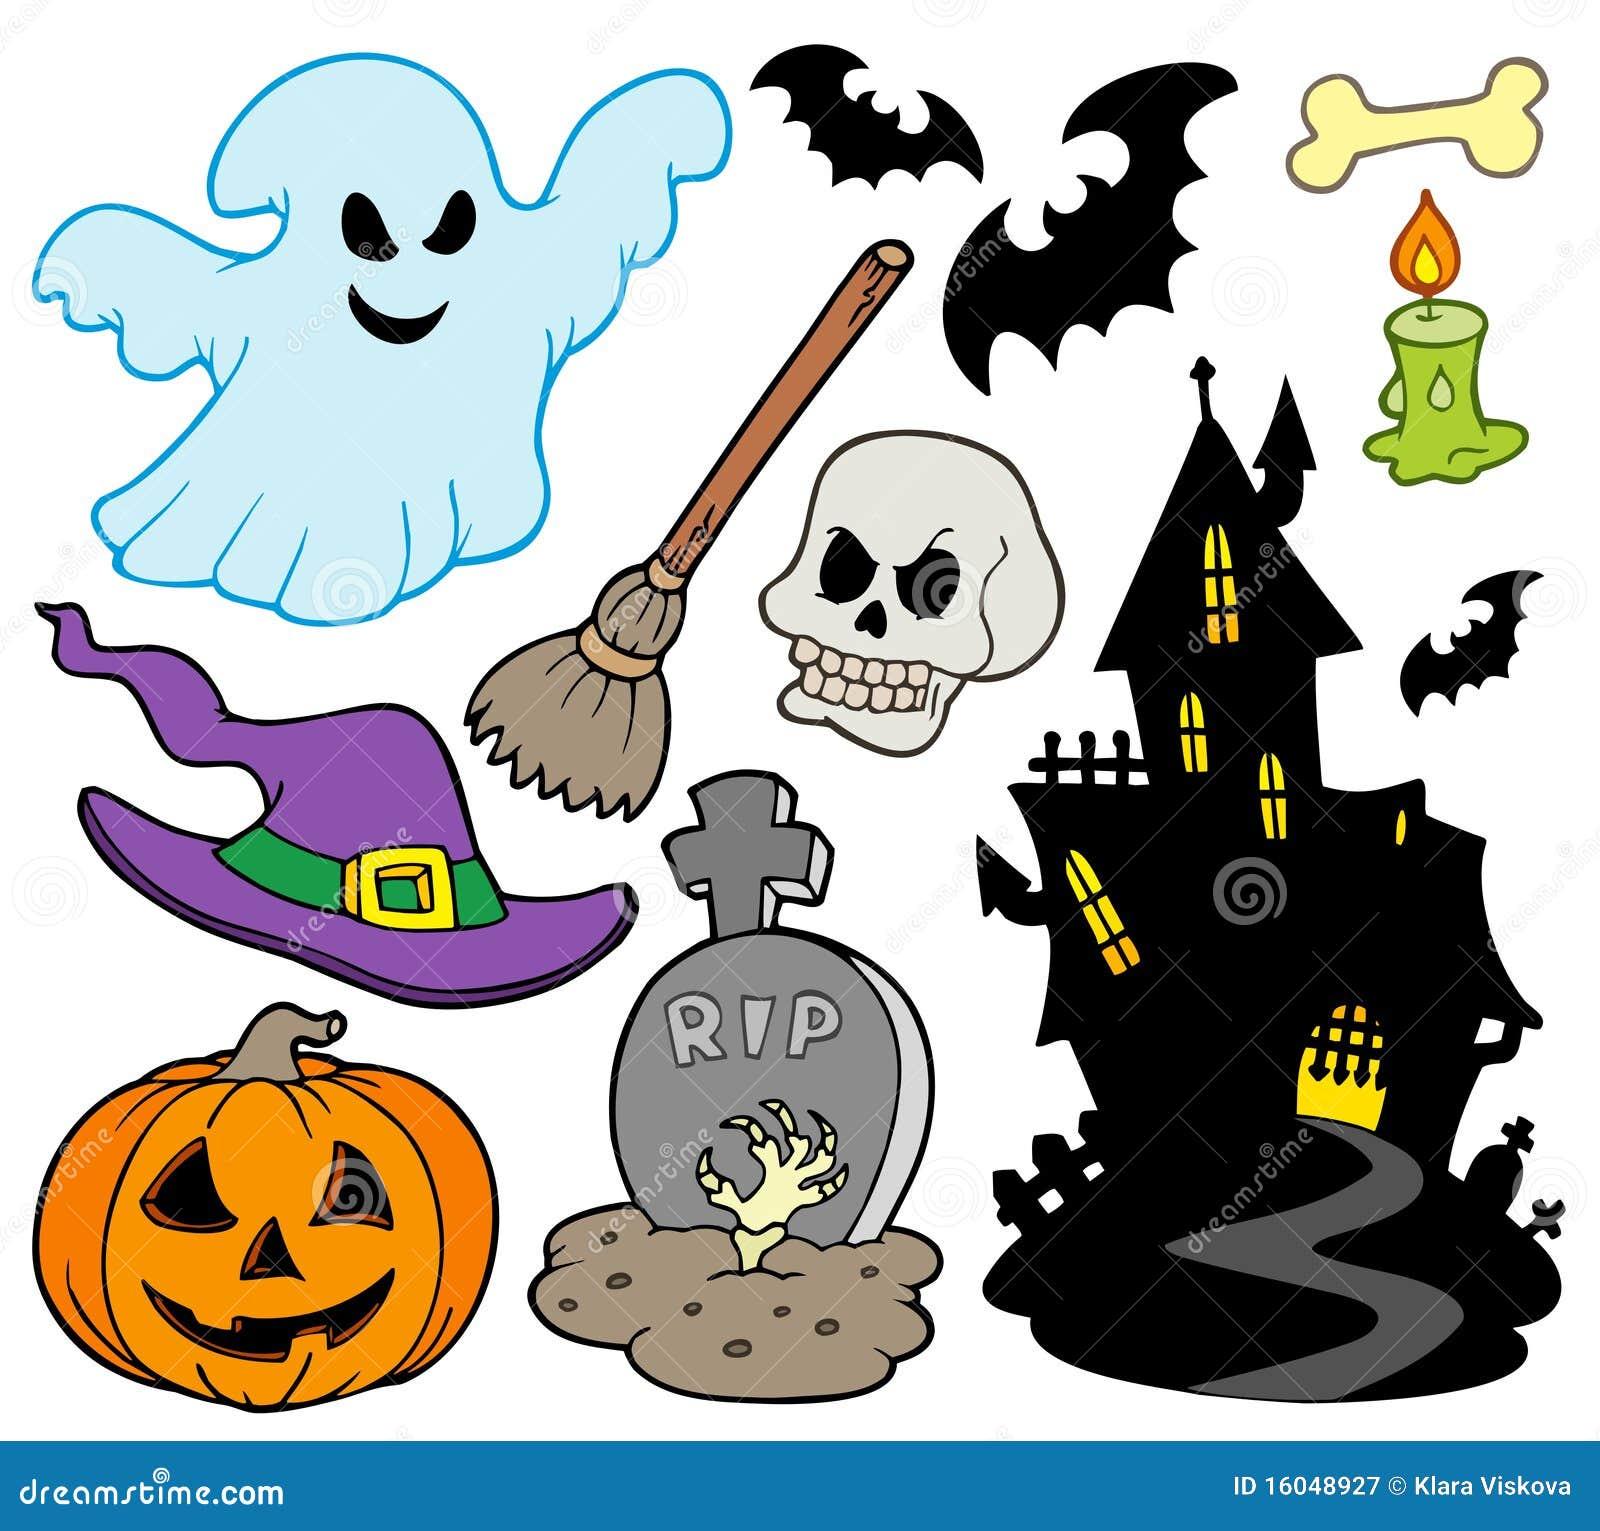 Set of Halloween images